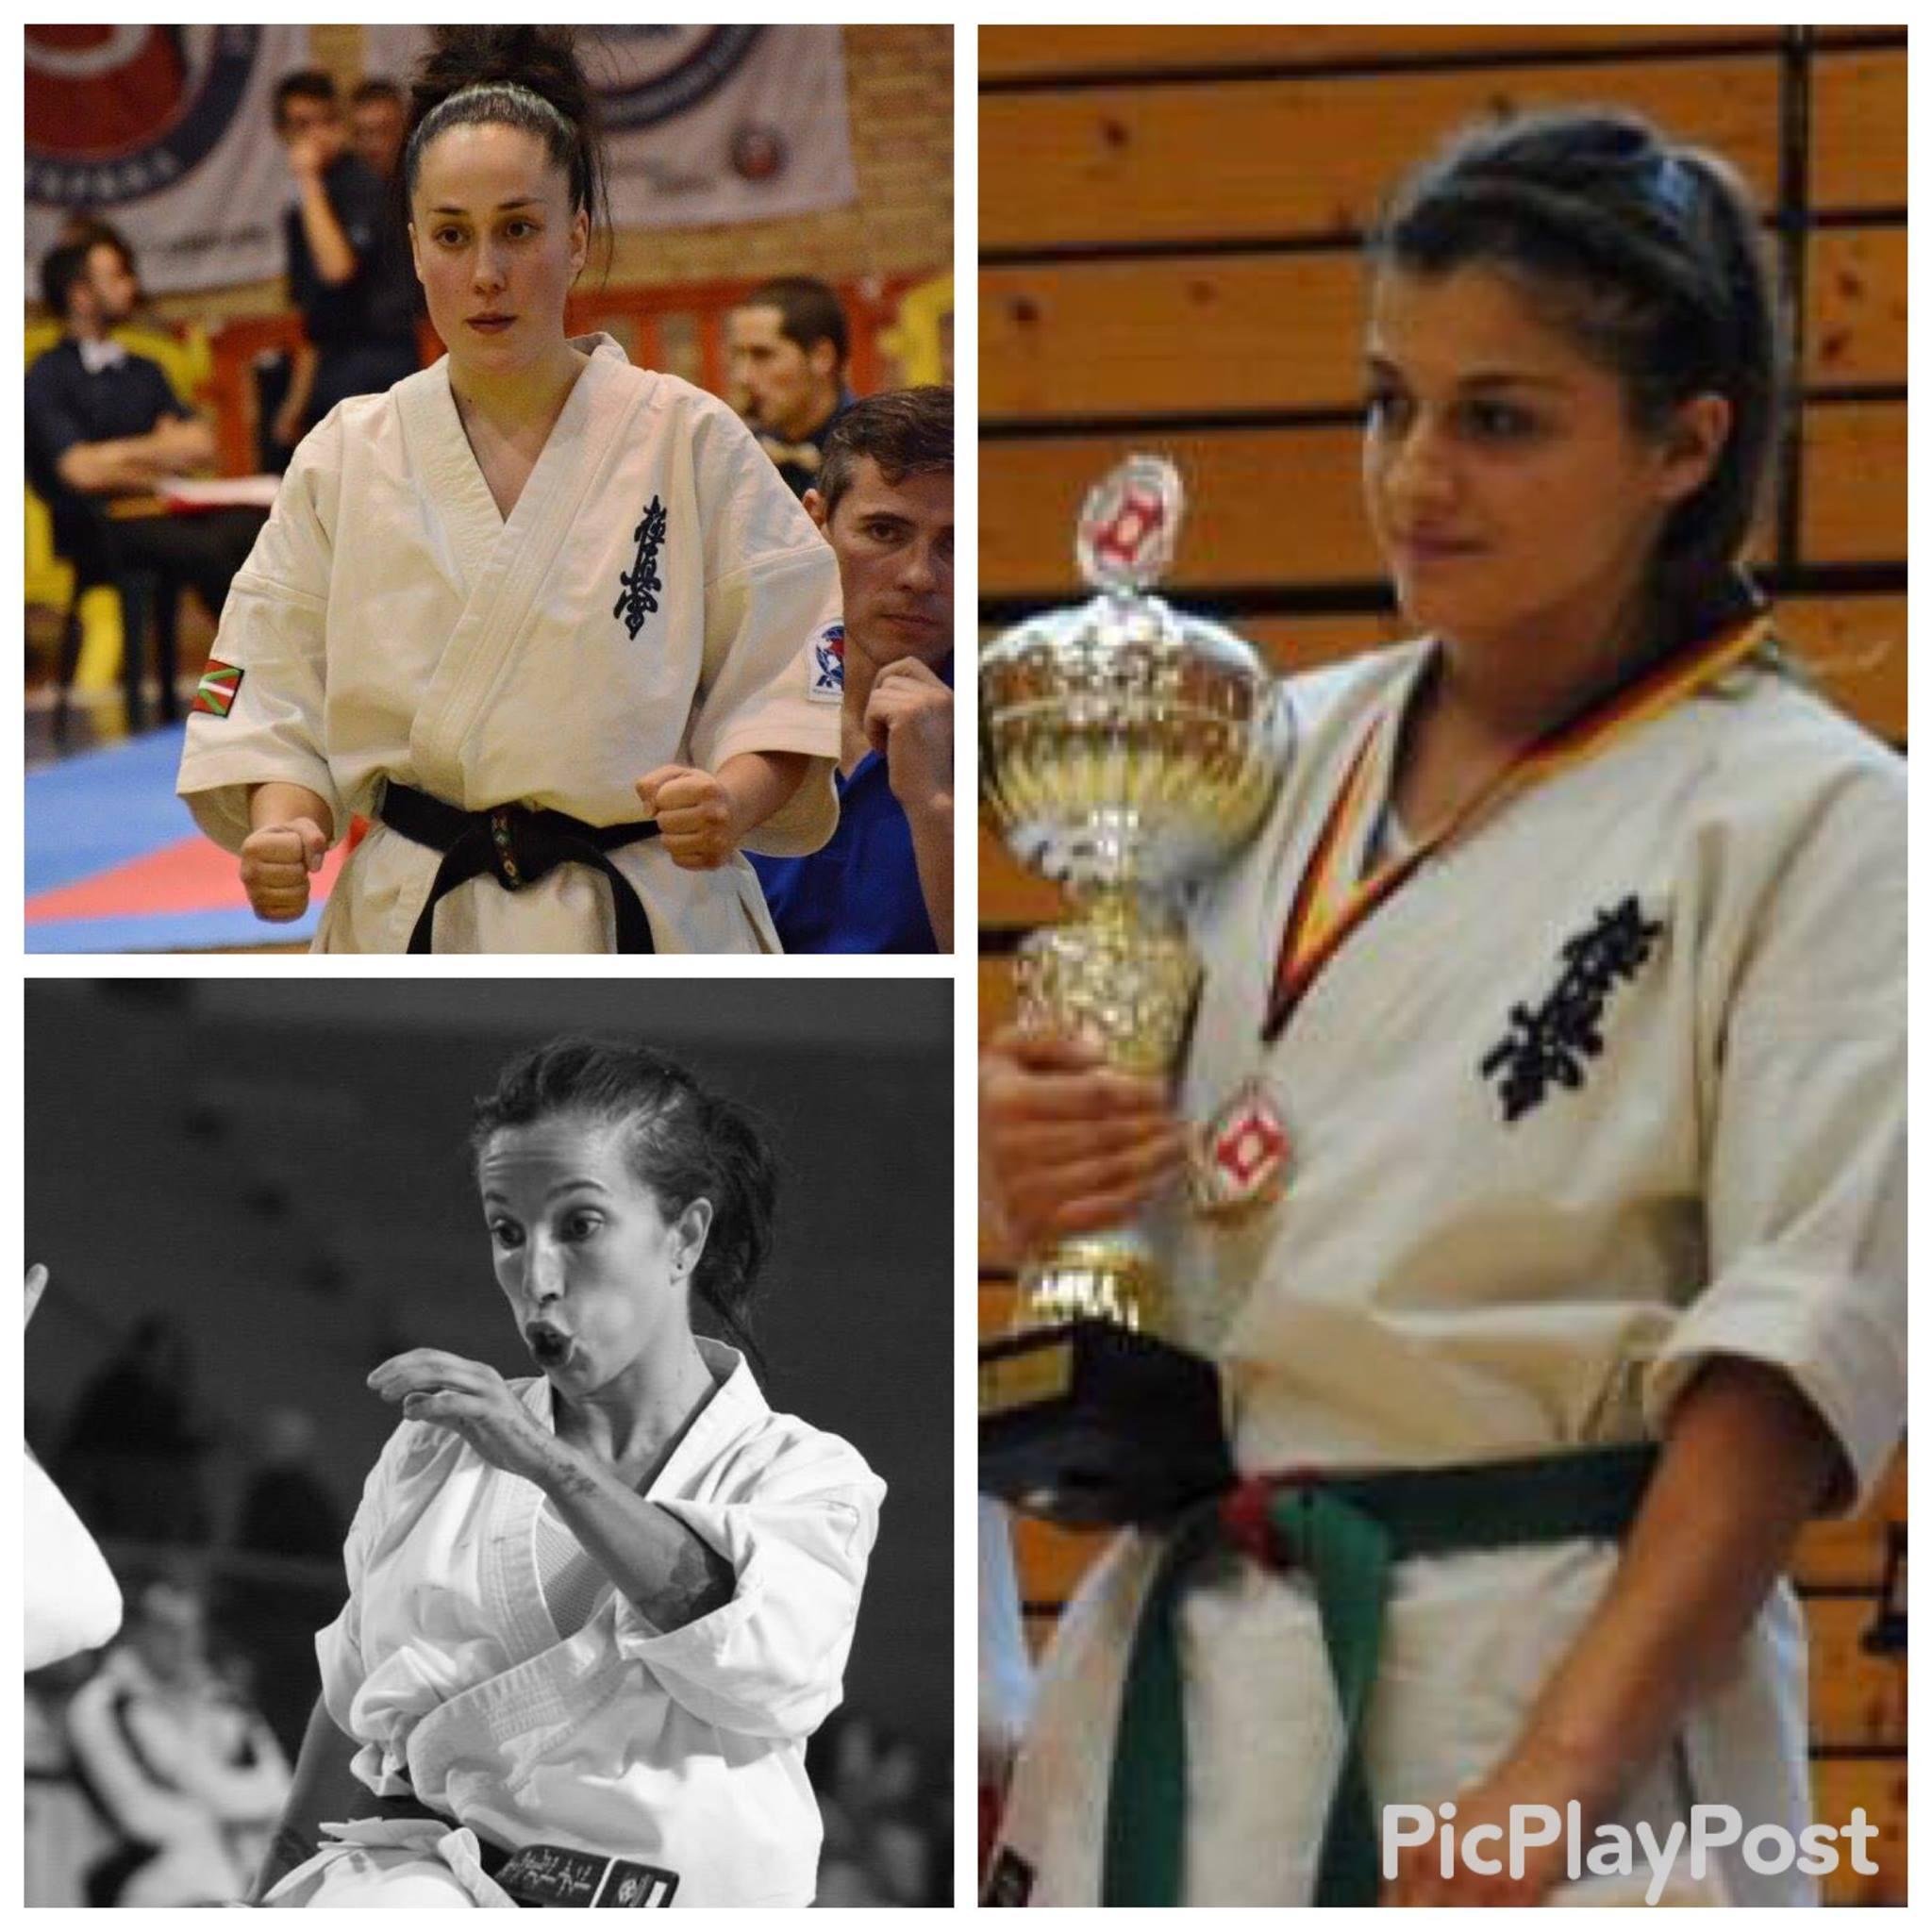 Teona Gazdeliani Womens Lightweight World Champion Rengokai 2015  Iria Fernandez Womens Lightweight European Championships 2014 2nd place  Rocio Maldonado Womens Lightweight Spanish Champion